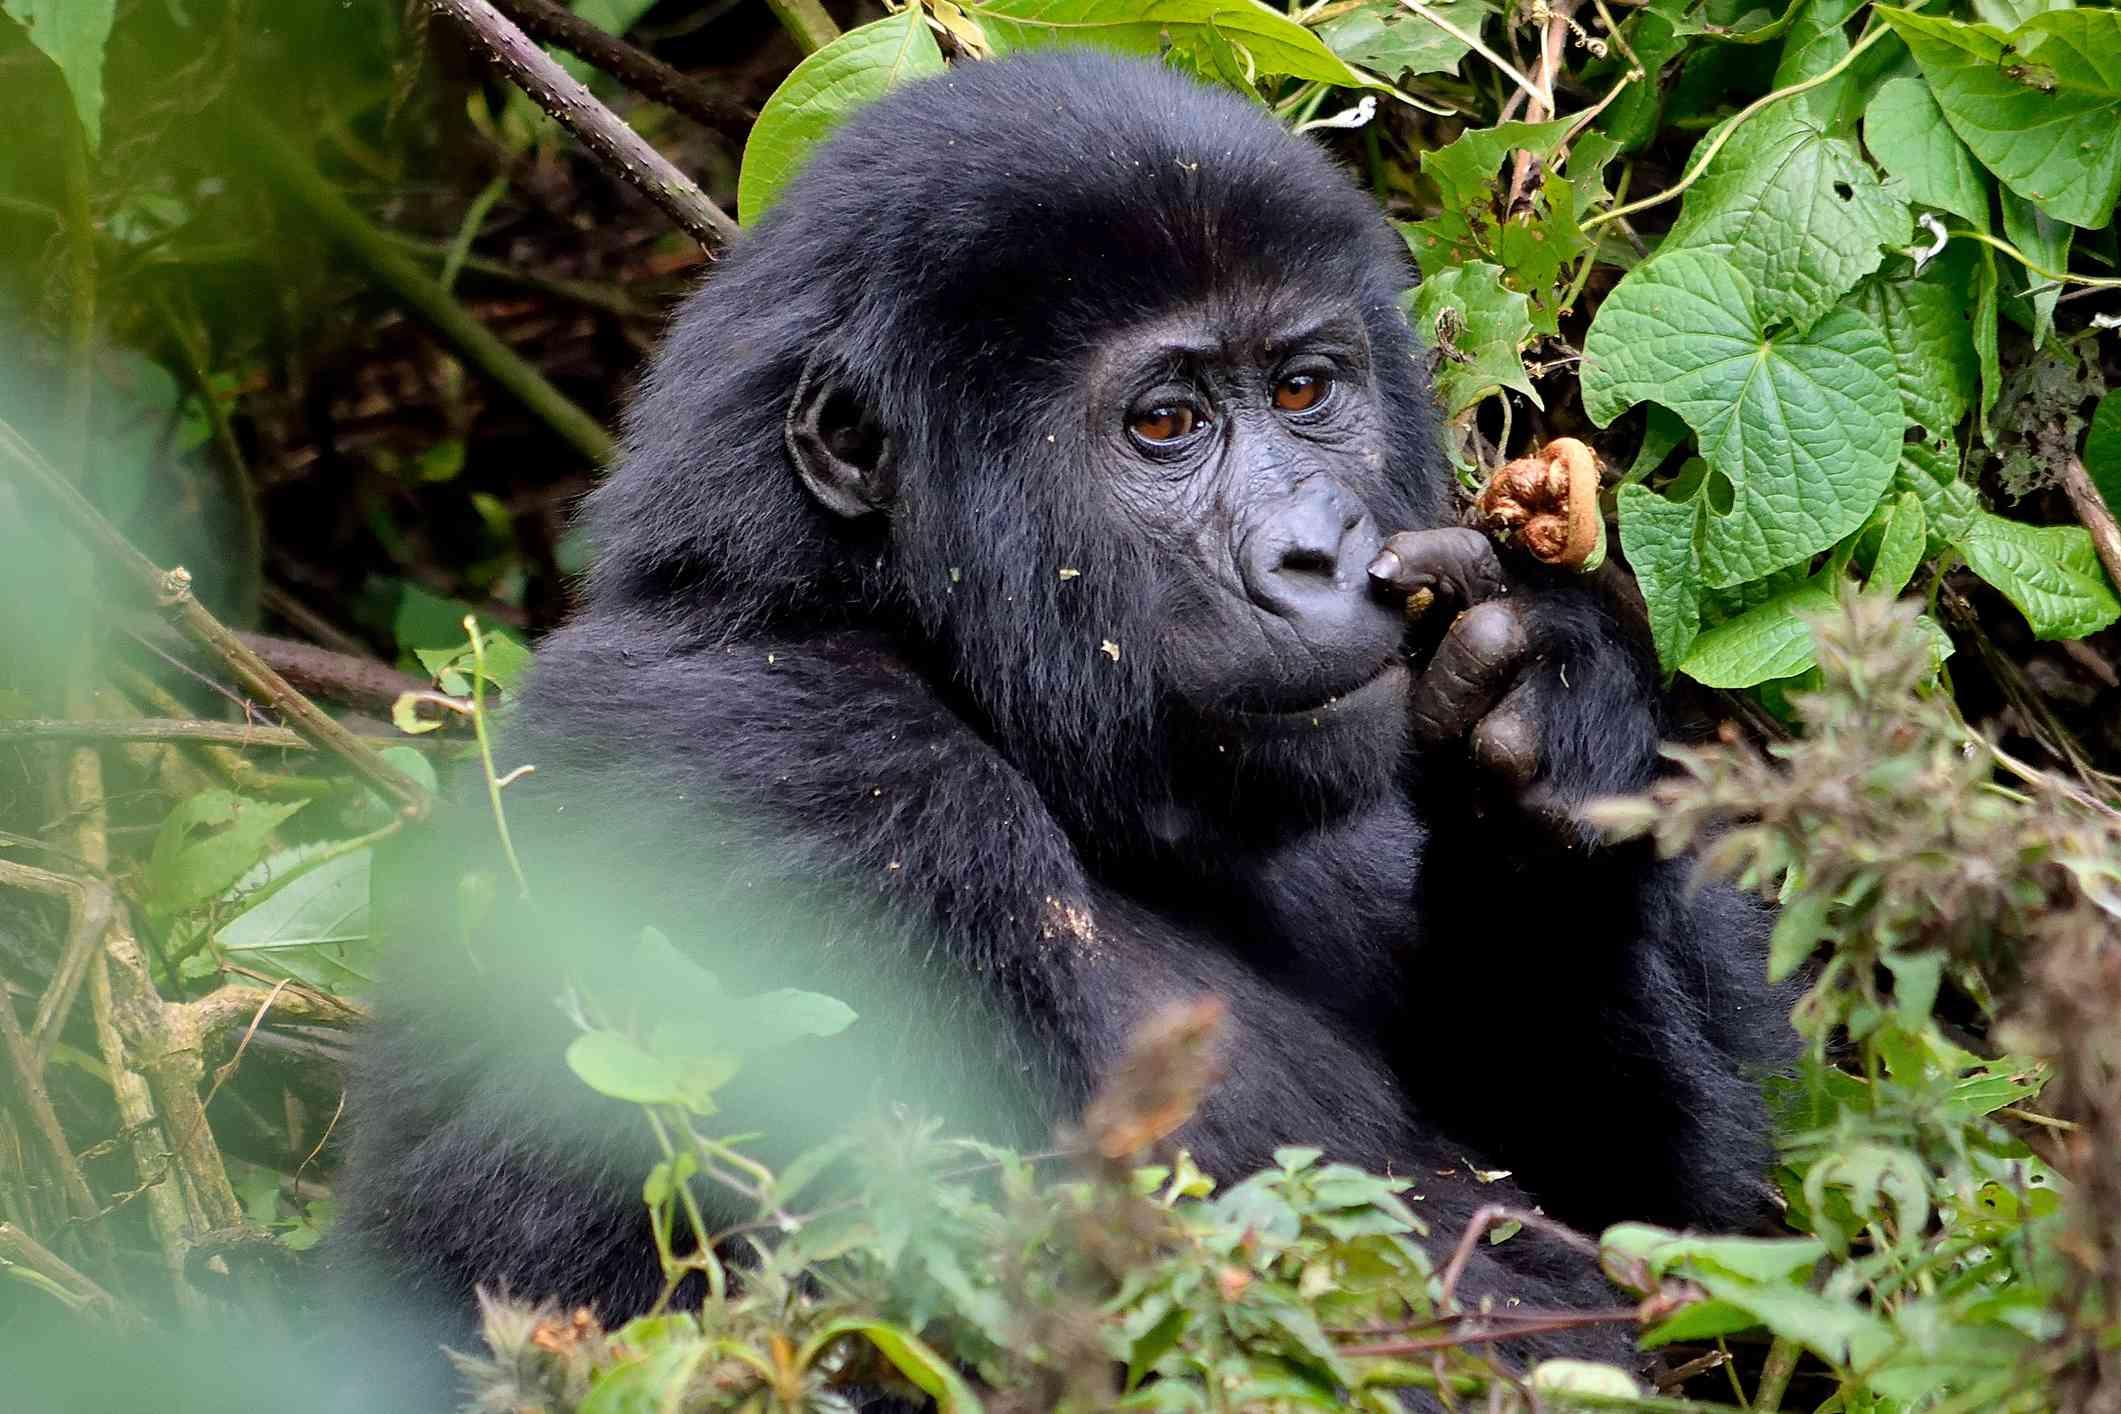 Young gorilla in Bwindi Impenetrable Forest, Uganda